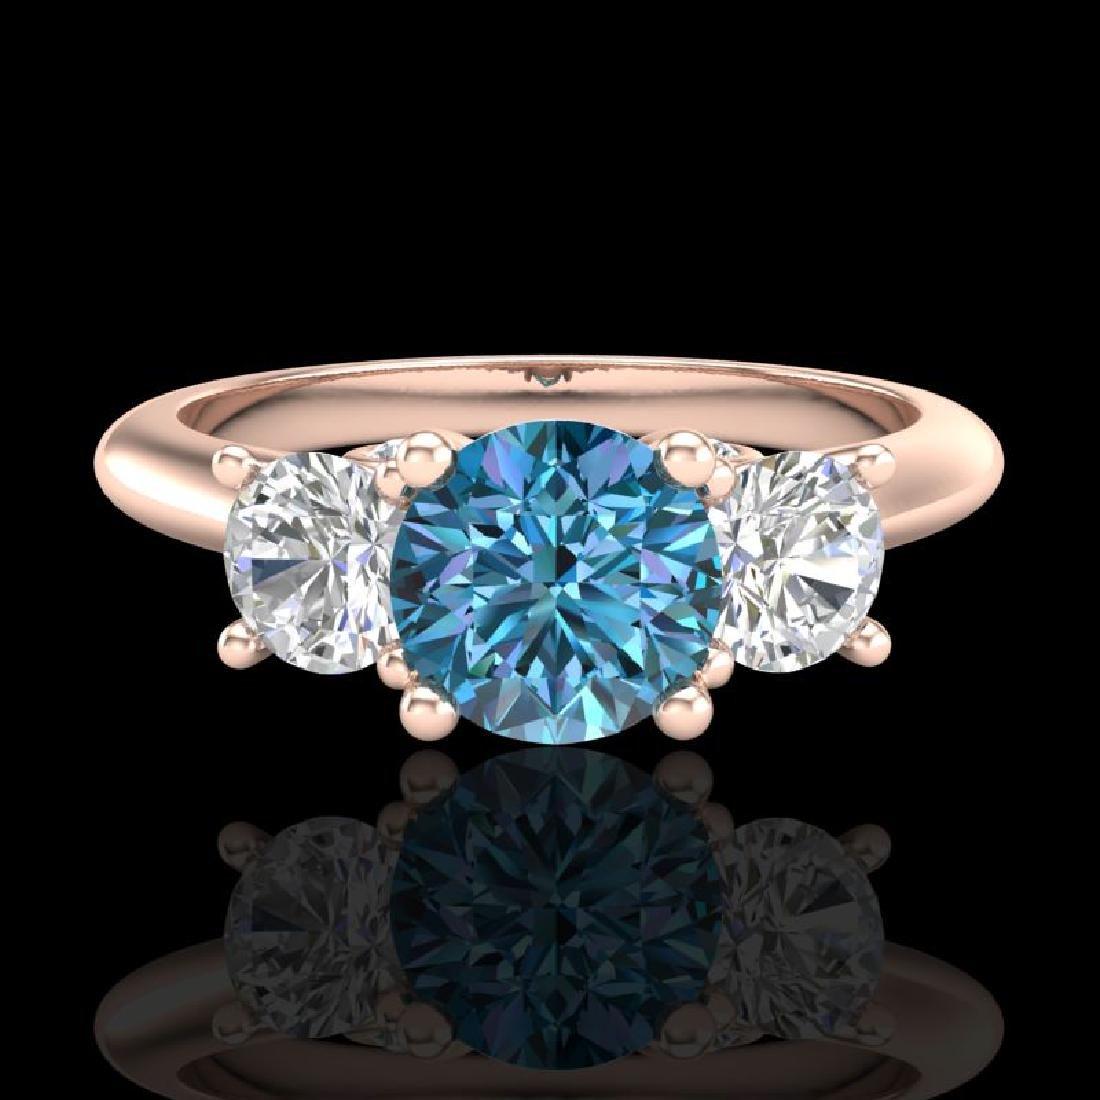 1.5 CTW Intense Blue Diamond Solitaire Art Deco 3 Stone - 2